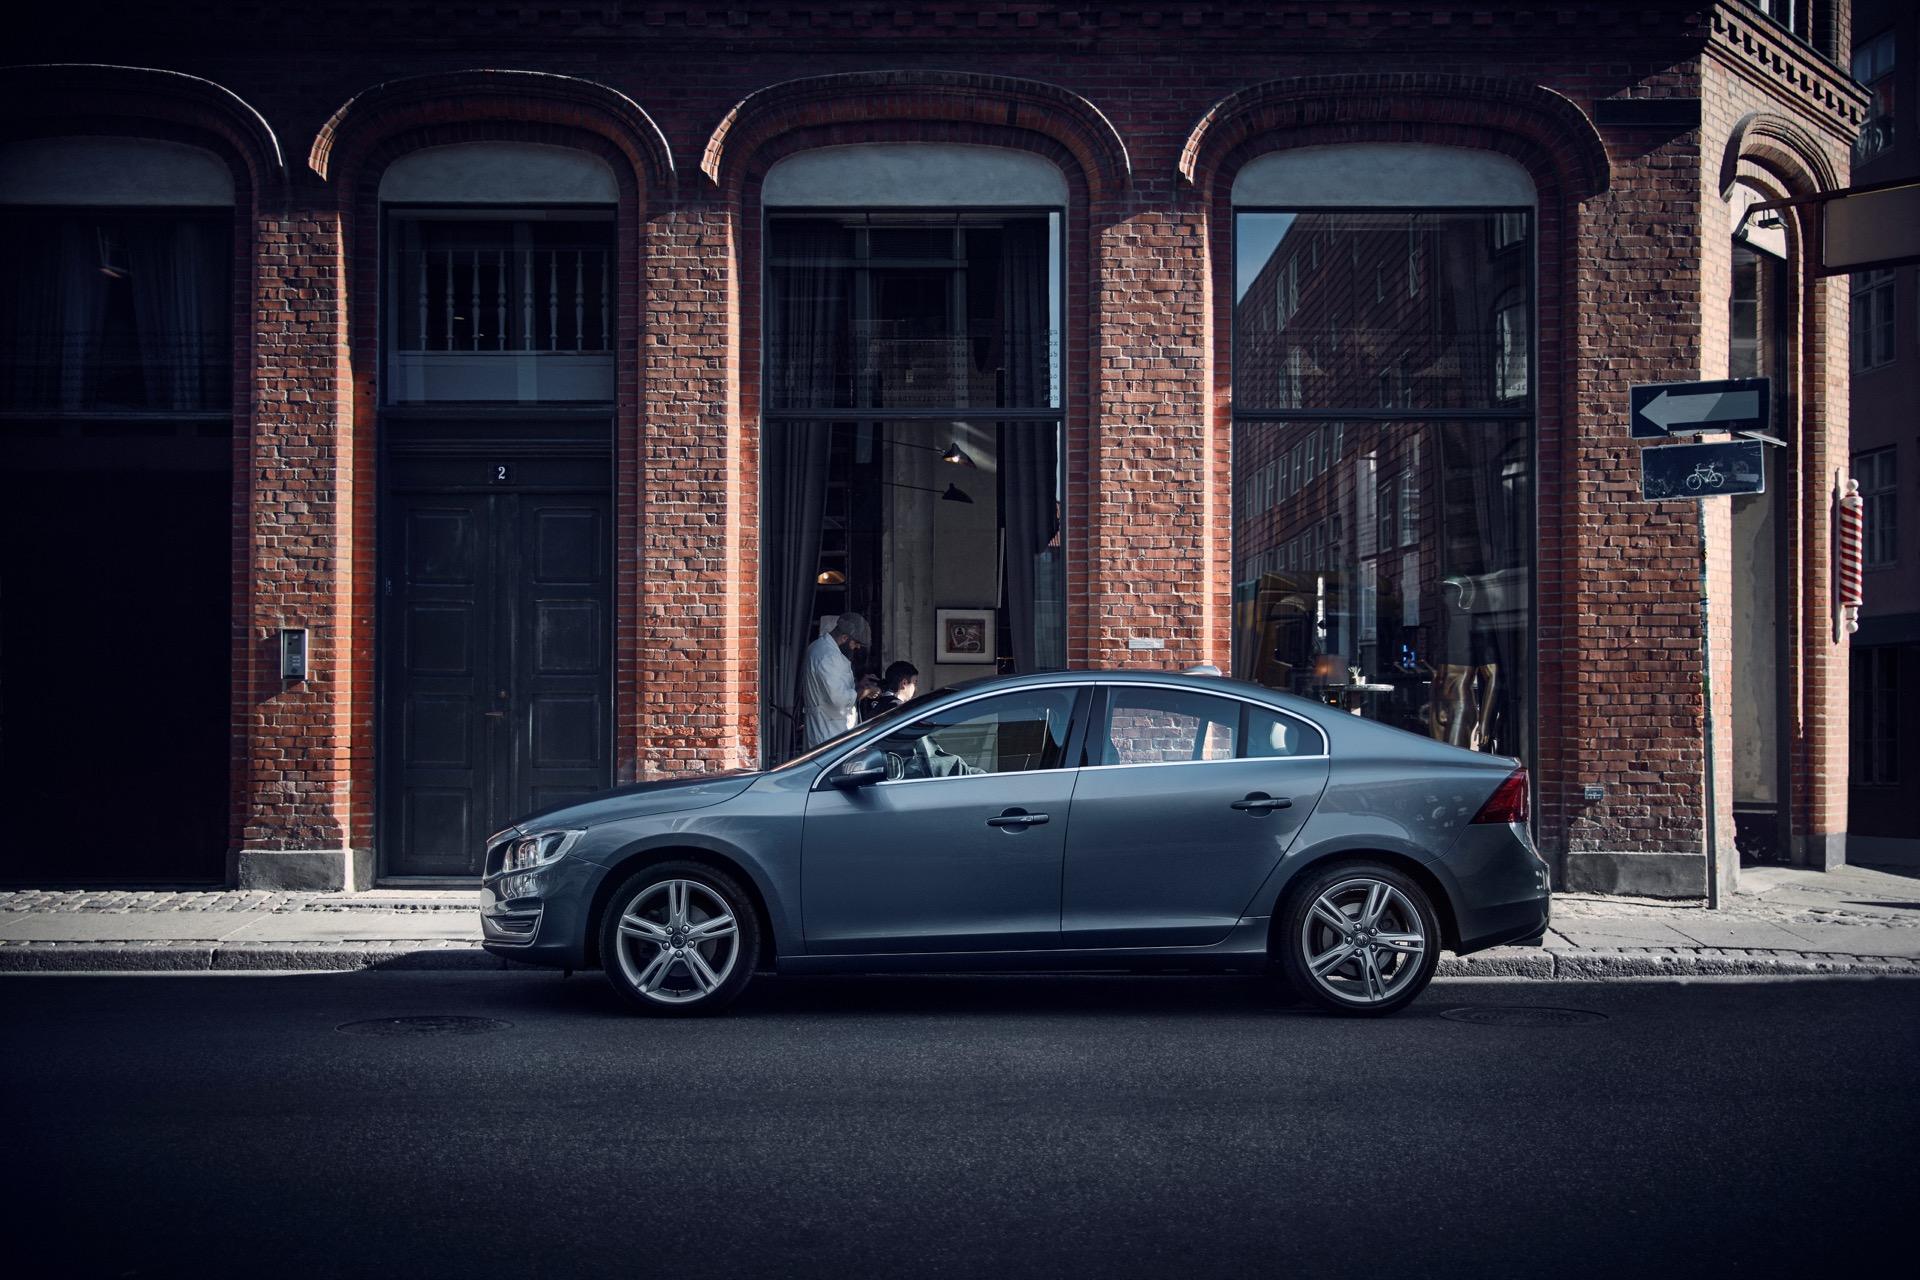 Volvo S60 Side -  2016, 2017, 2017 S60, Design, Exterior, Images, S60, Volvo